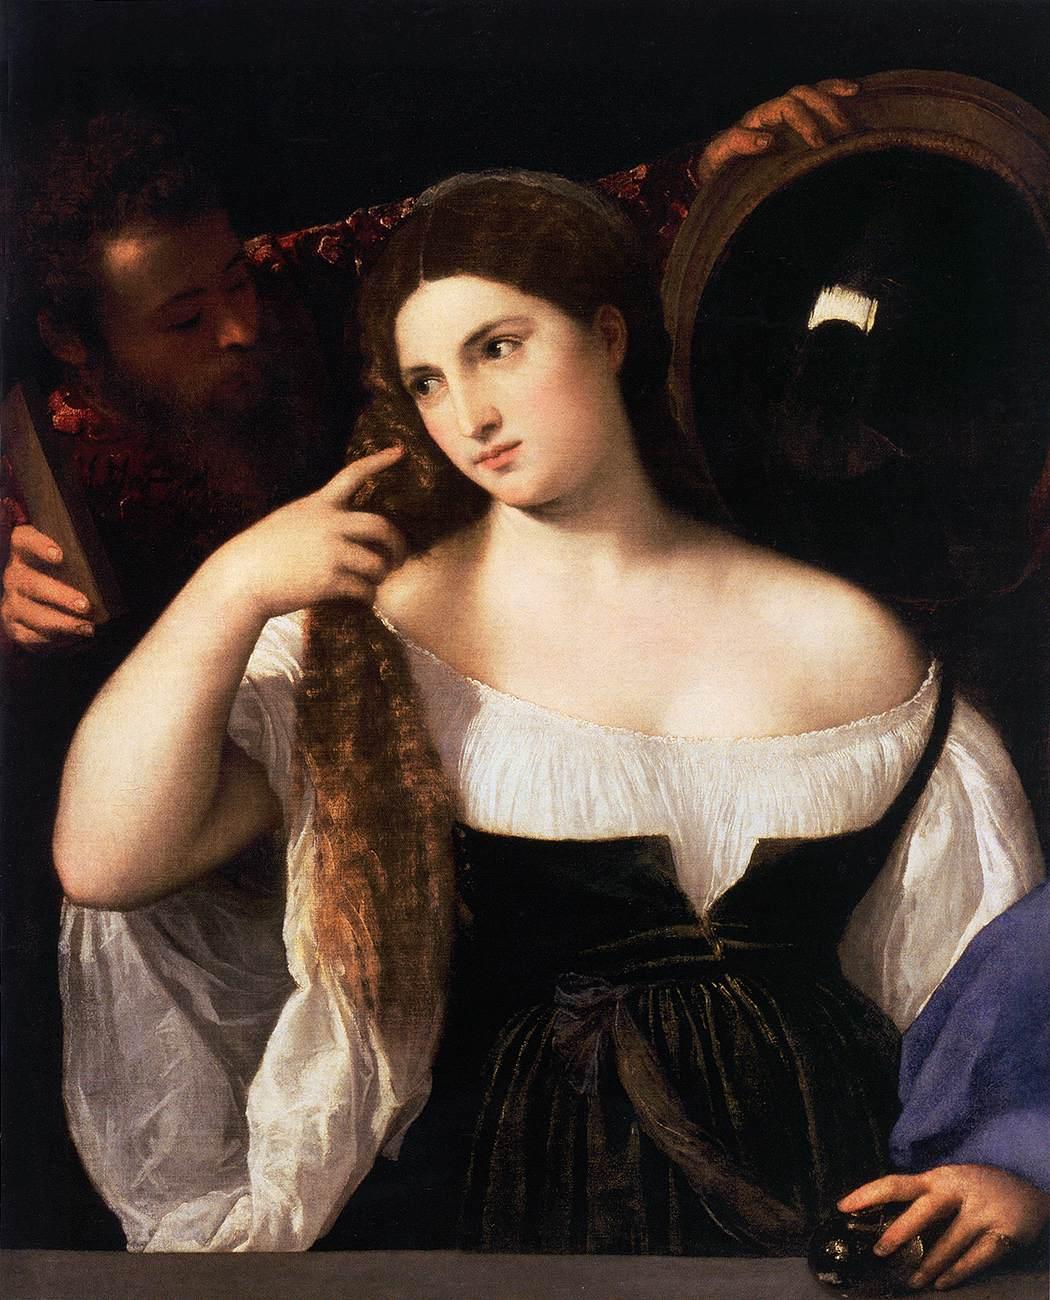 Woman with a Mirror by TIZIANO Vecellio - 2 women portraits 16th century hall ôîòî